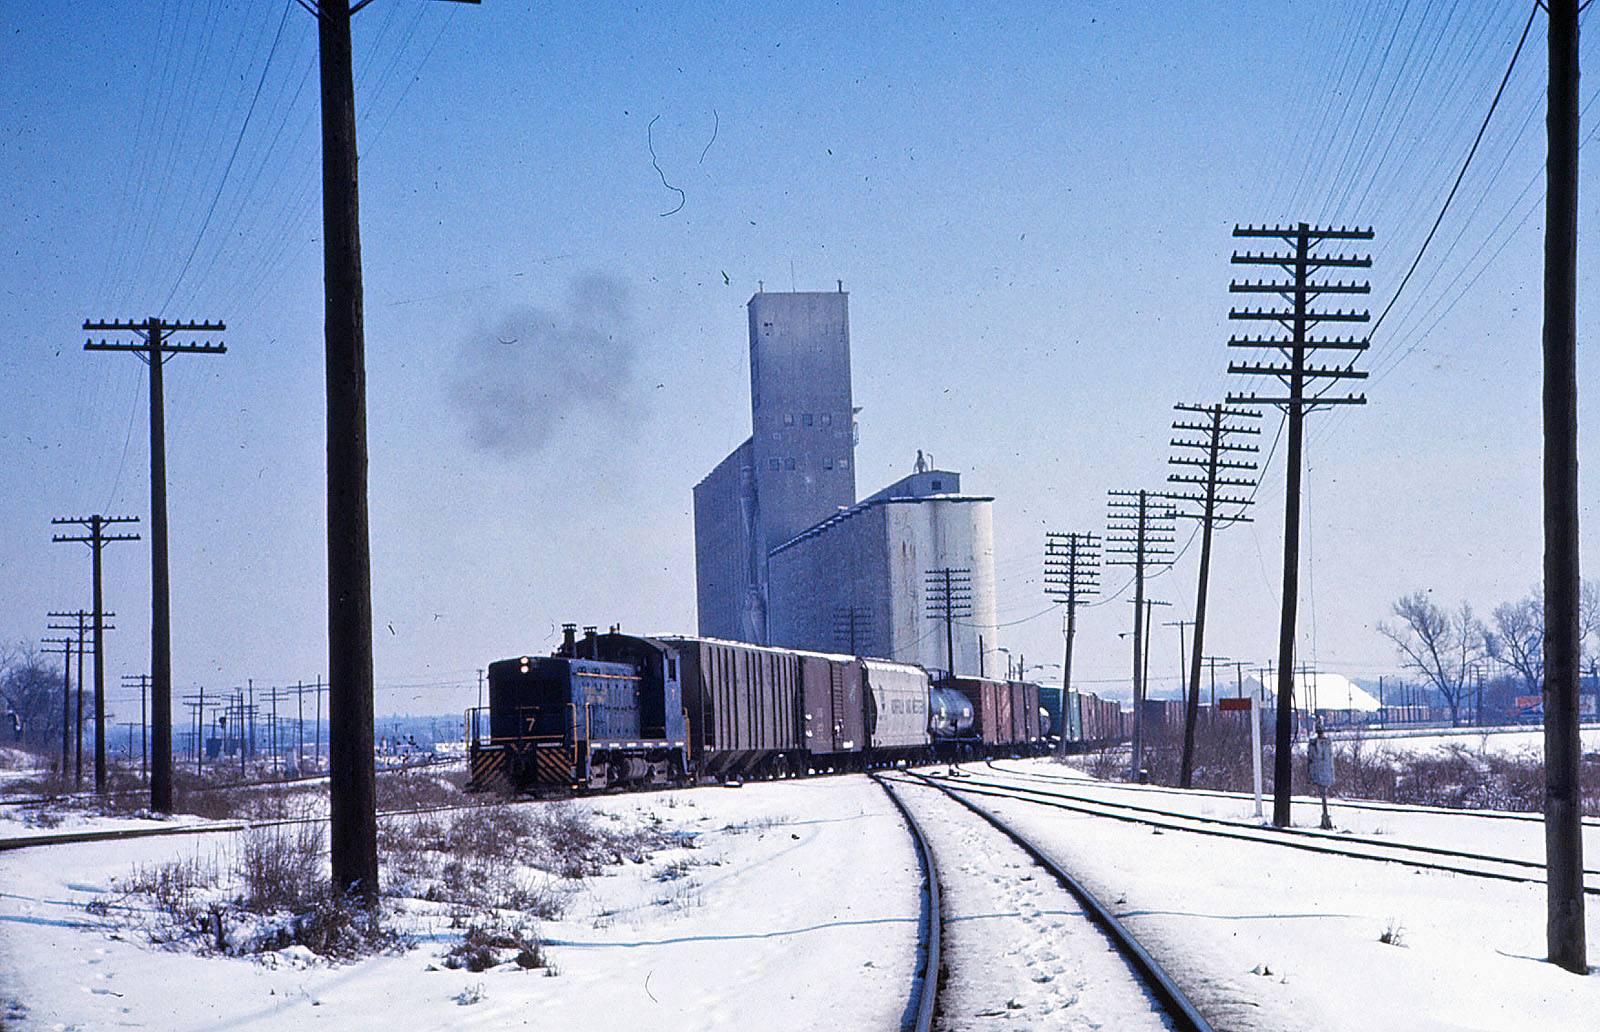 Transportation Company - Des Moines Union - Railroad